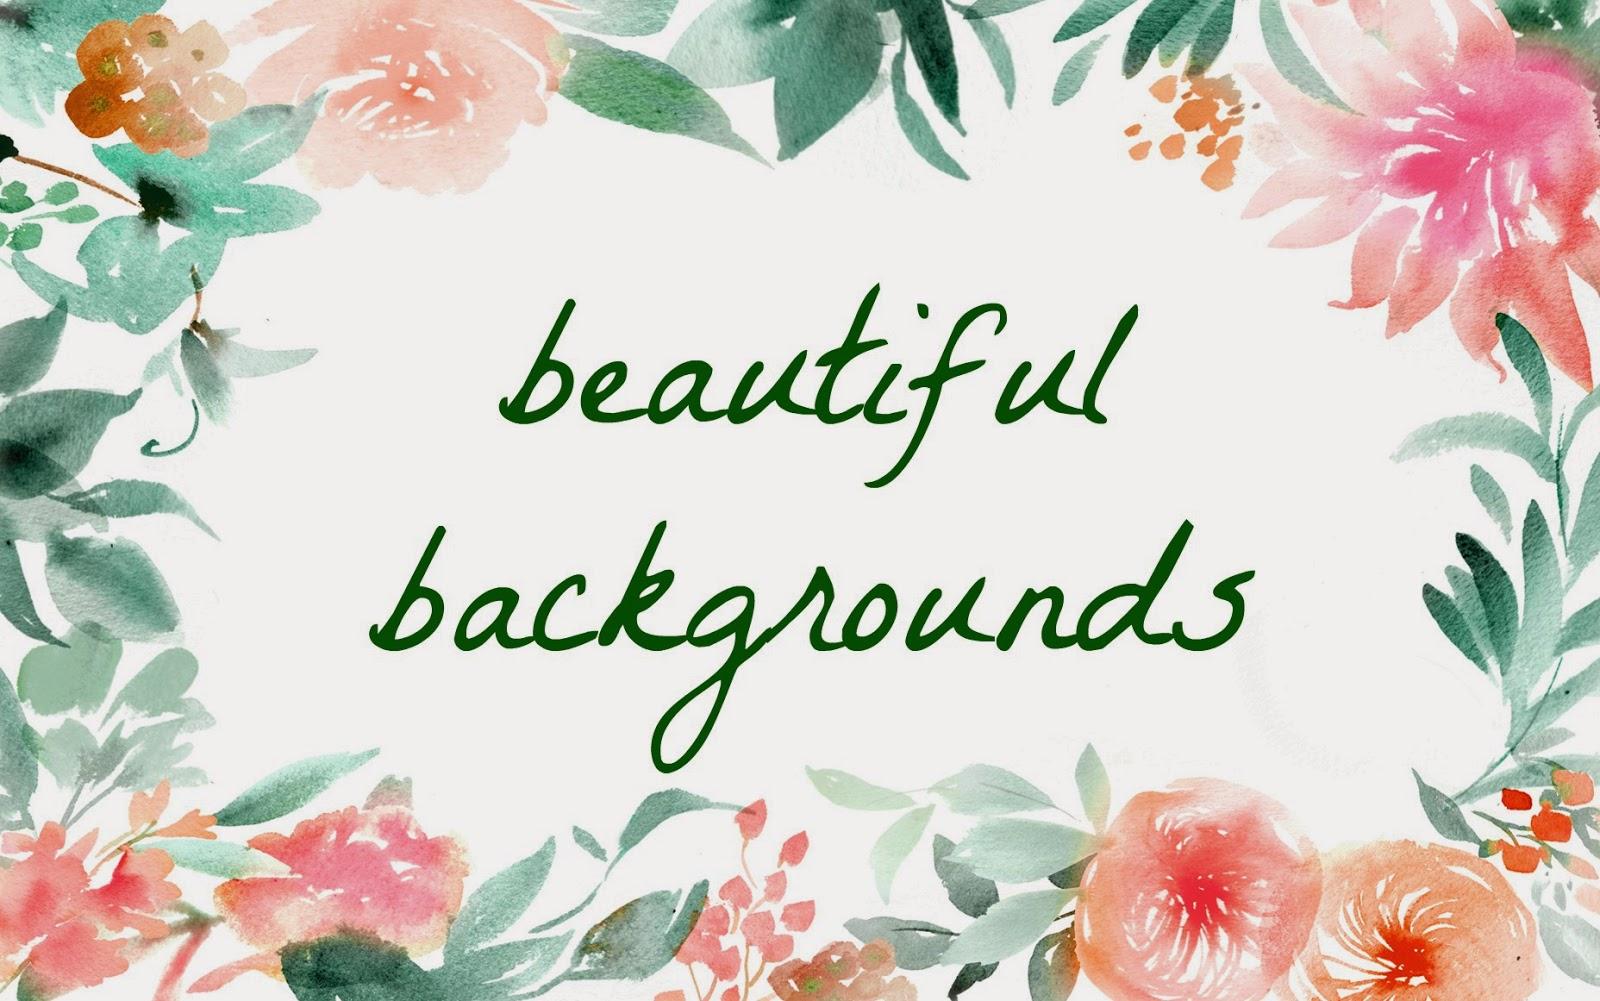 Log Home Design App 10x Beautiful Background Iris Girlscene